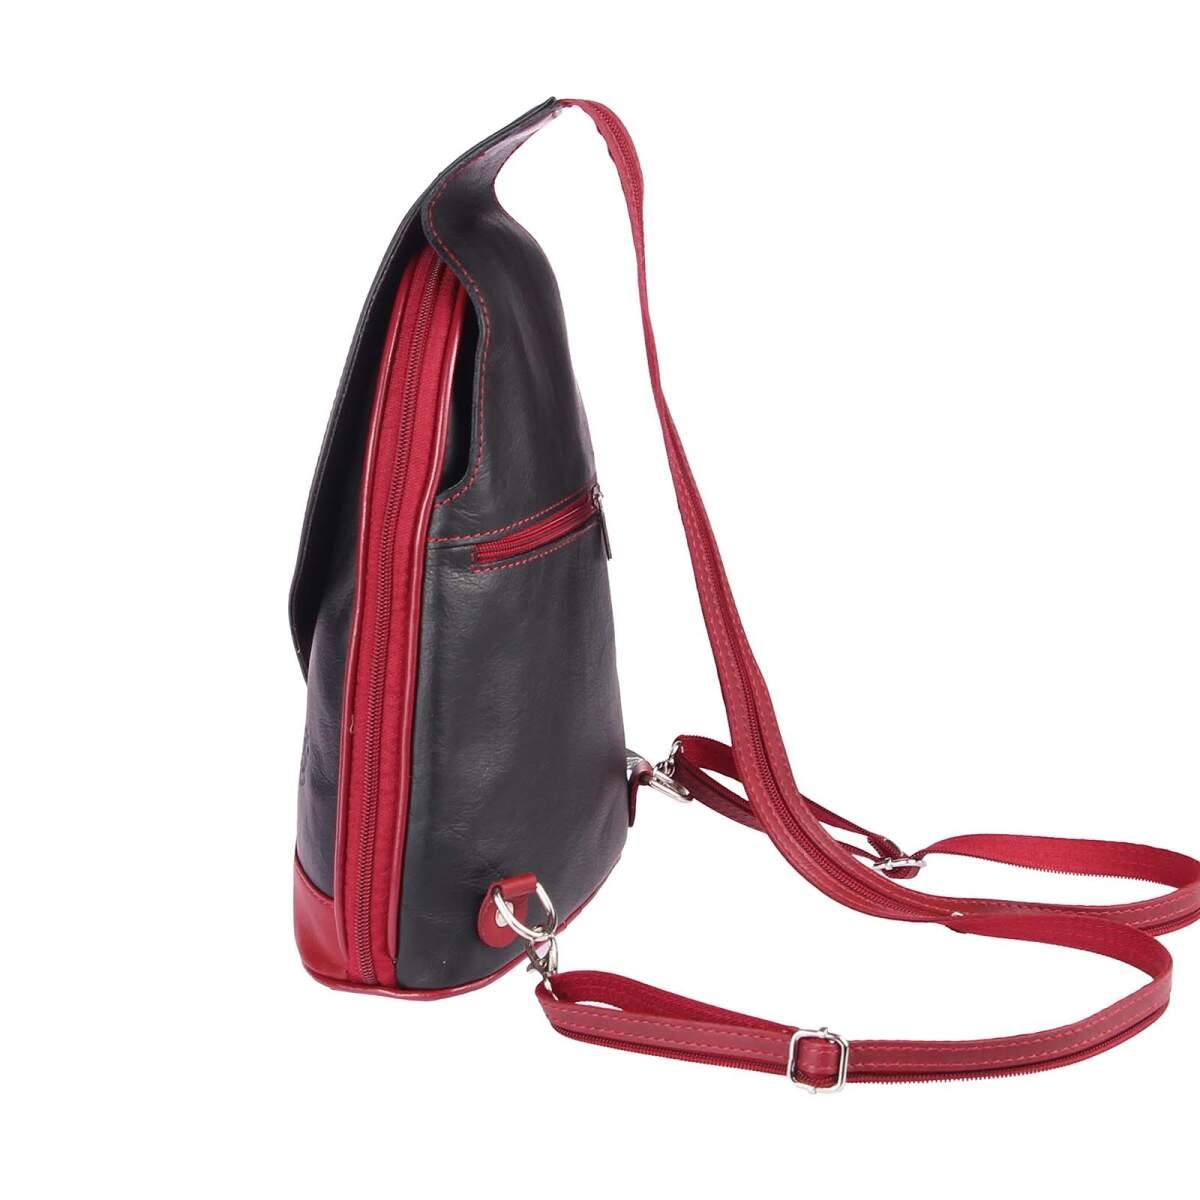 obc made in italy damen echt leder rucksack minirucksack lederrucksack tasche schultertasche. Black Bedroom Furniture Sets. Home Design Ideas